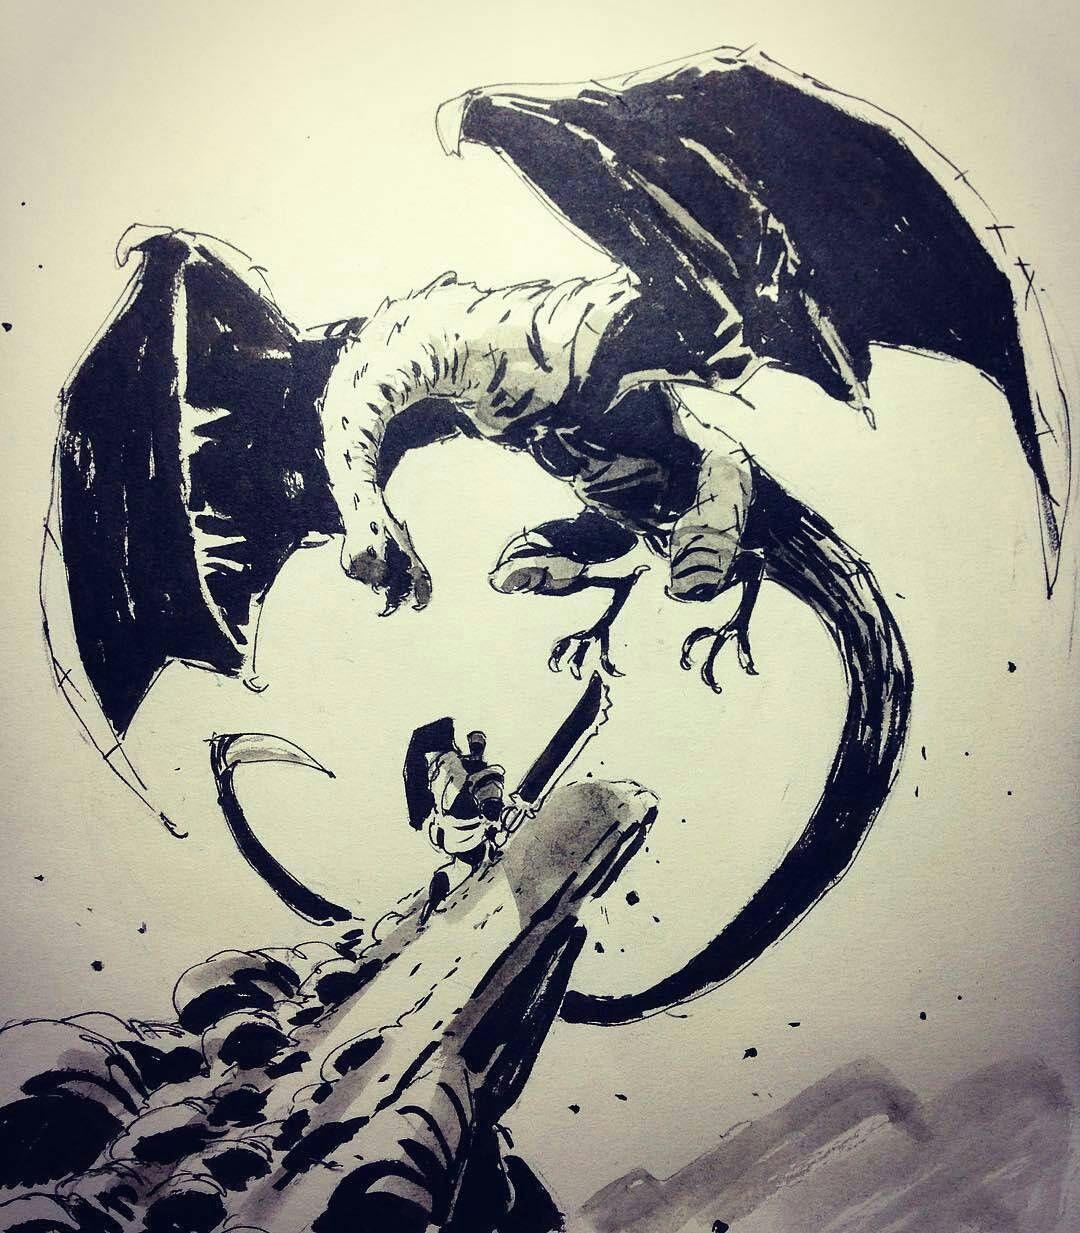 killer piece of fantasyart by one my favorite instagram artists ullikummi of a dragon